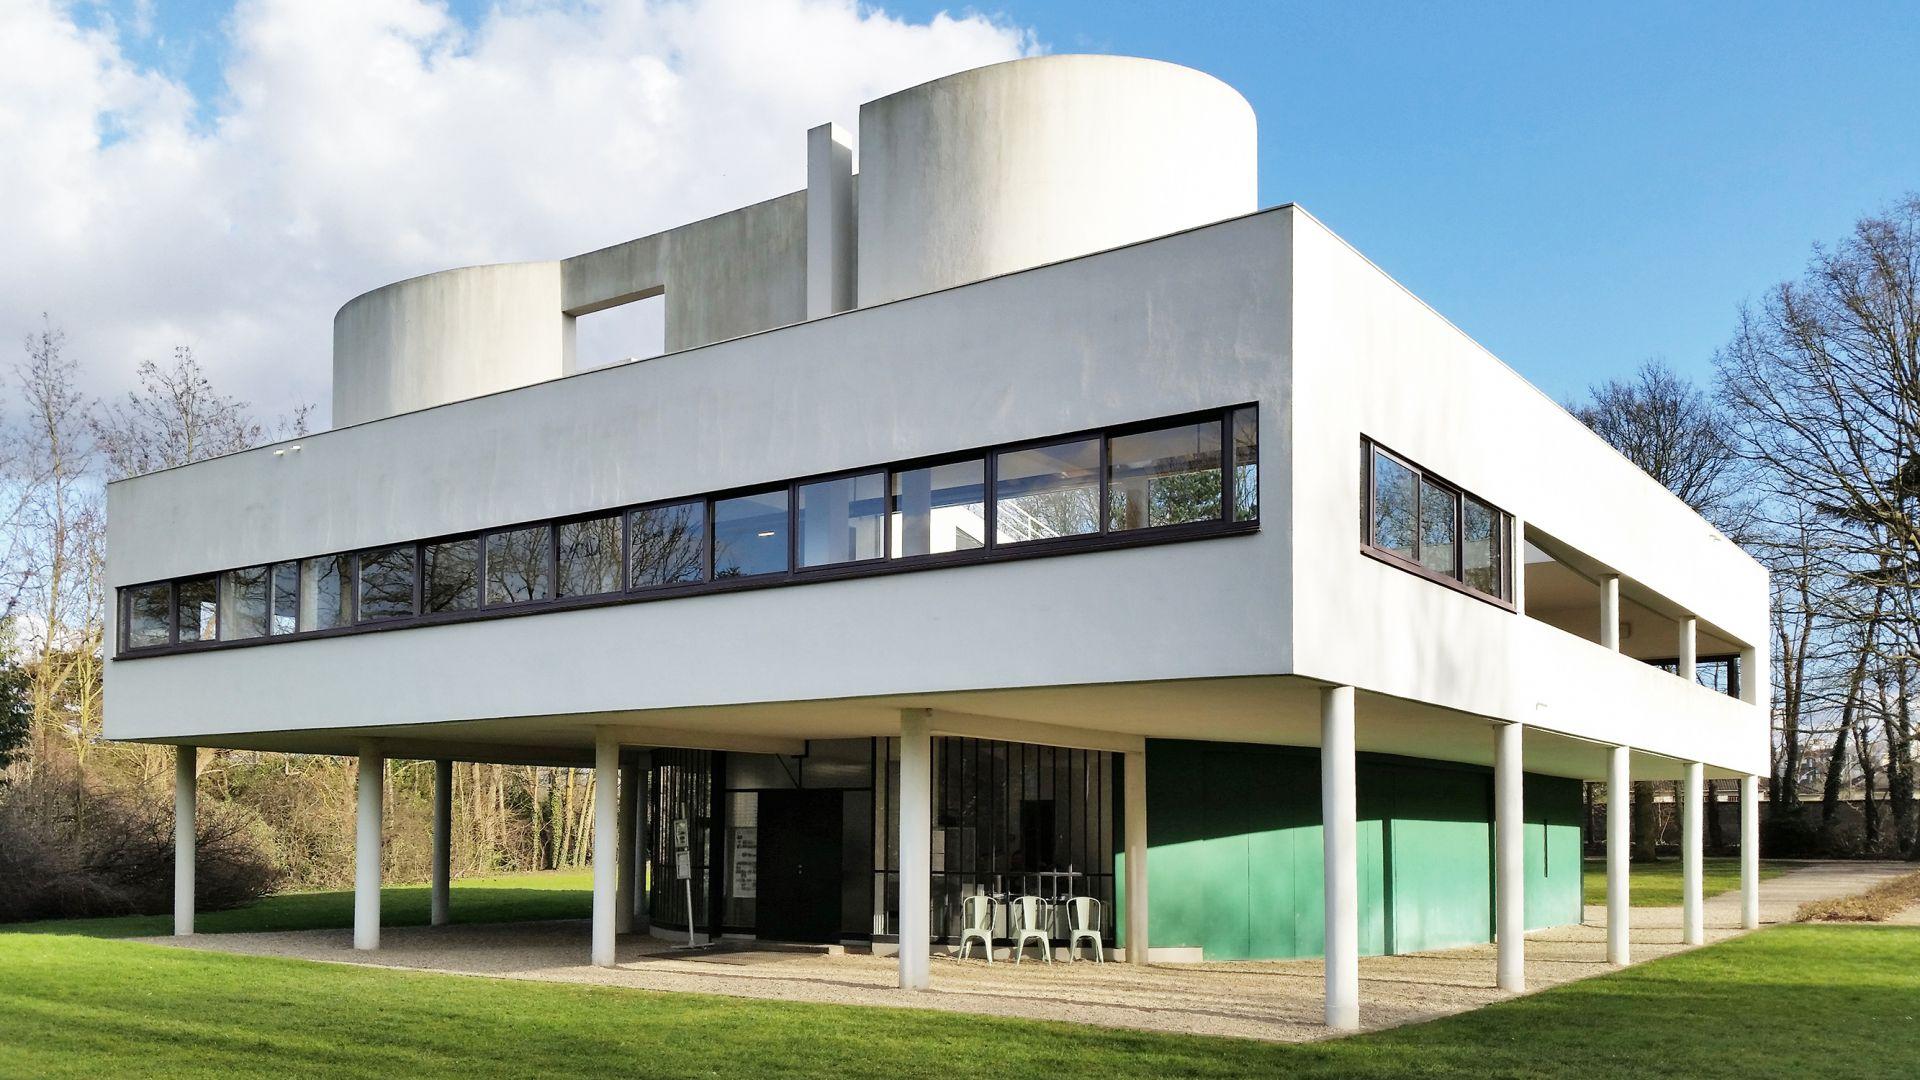 Villa Savoye - modlar.com